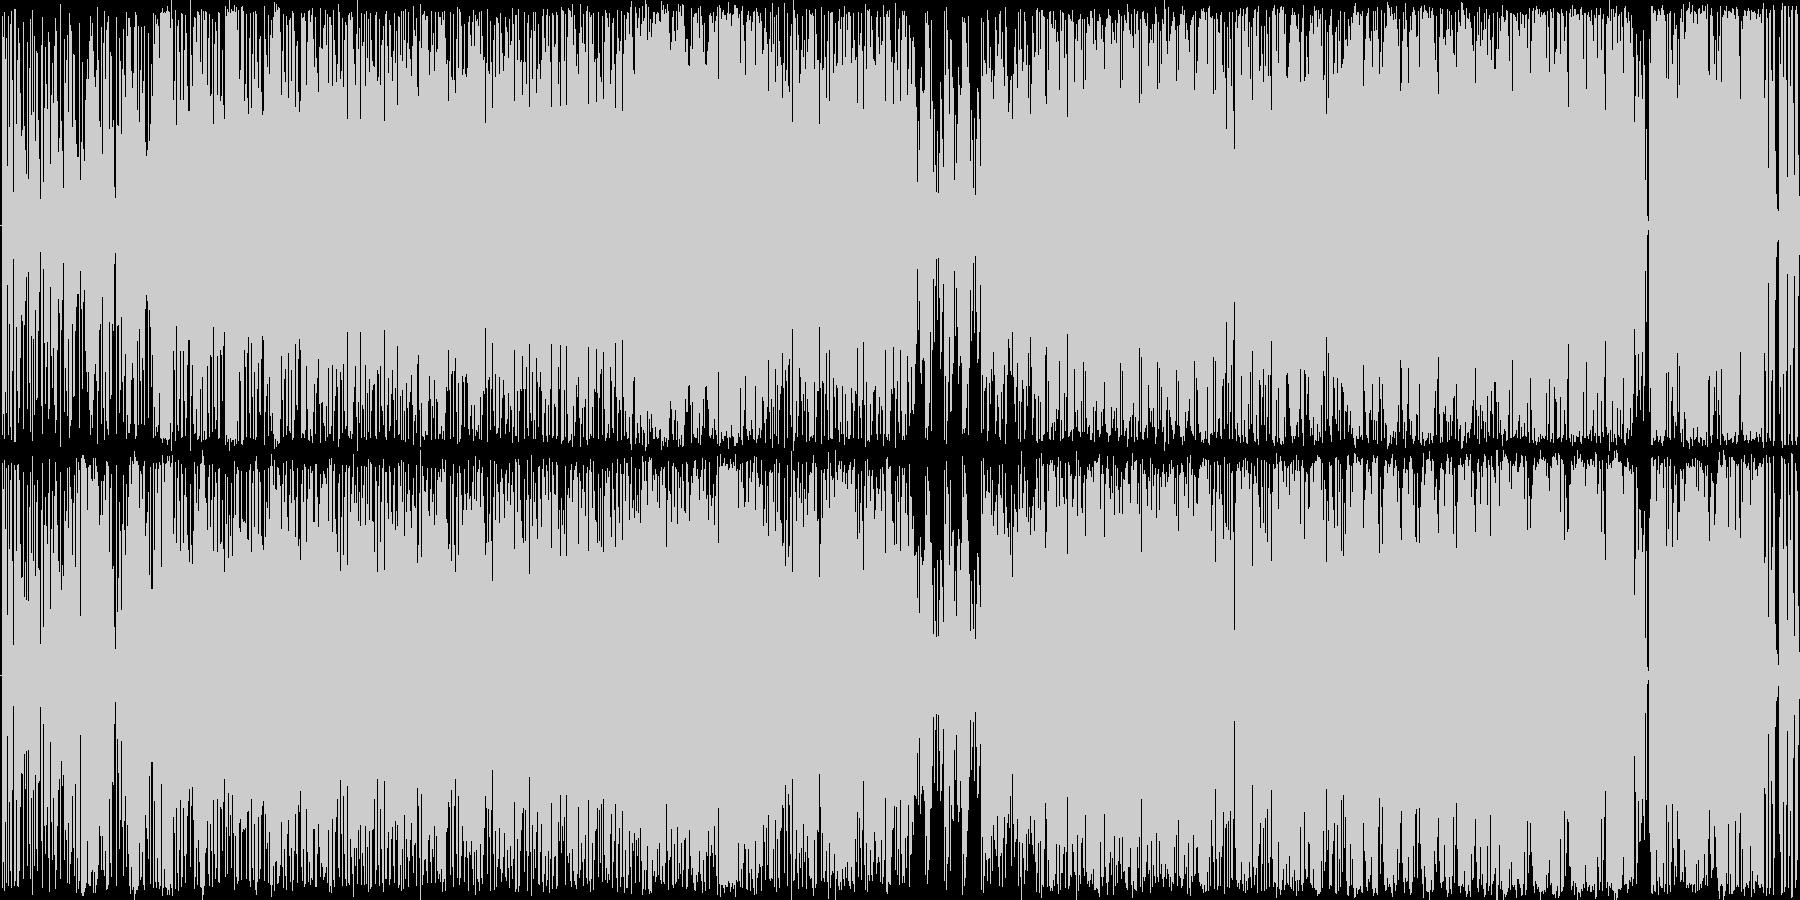 funk風HIPHOPトラックBGMの未再生の波形